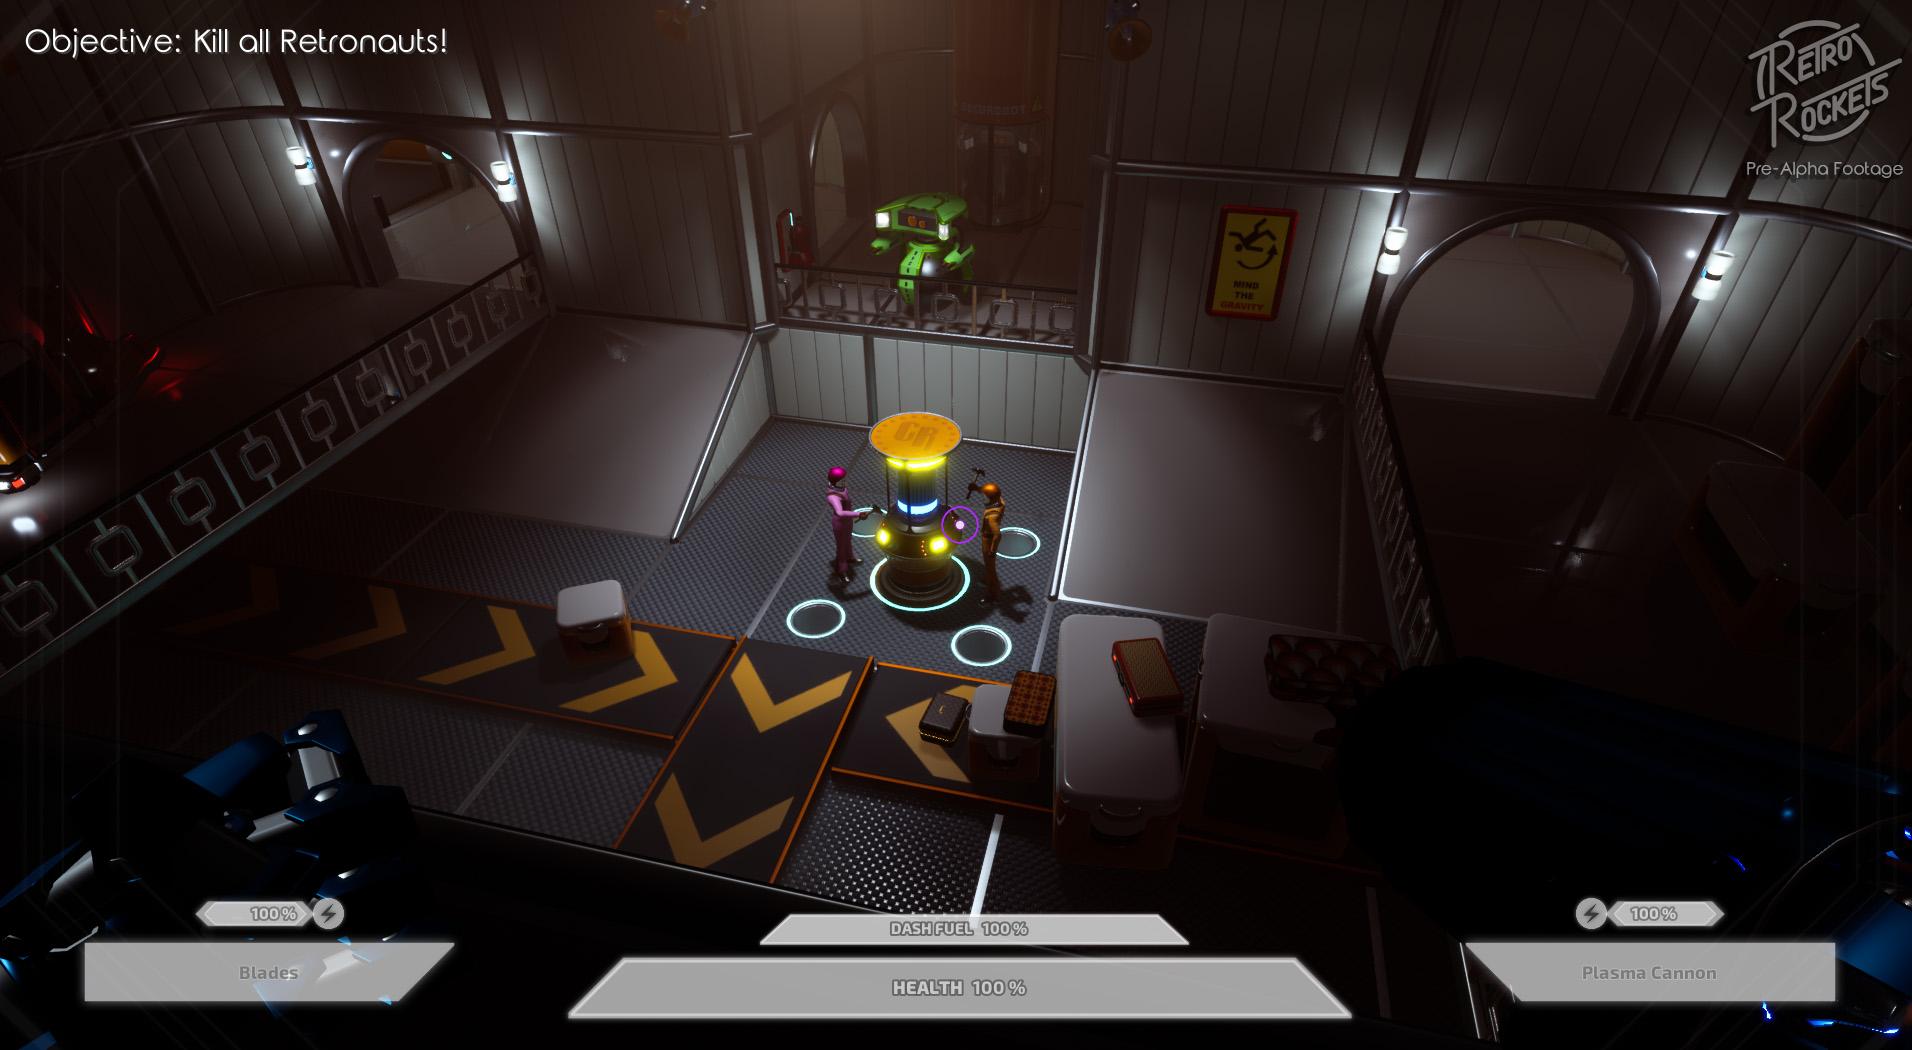 gameplayScreenshot_03.jpg